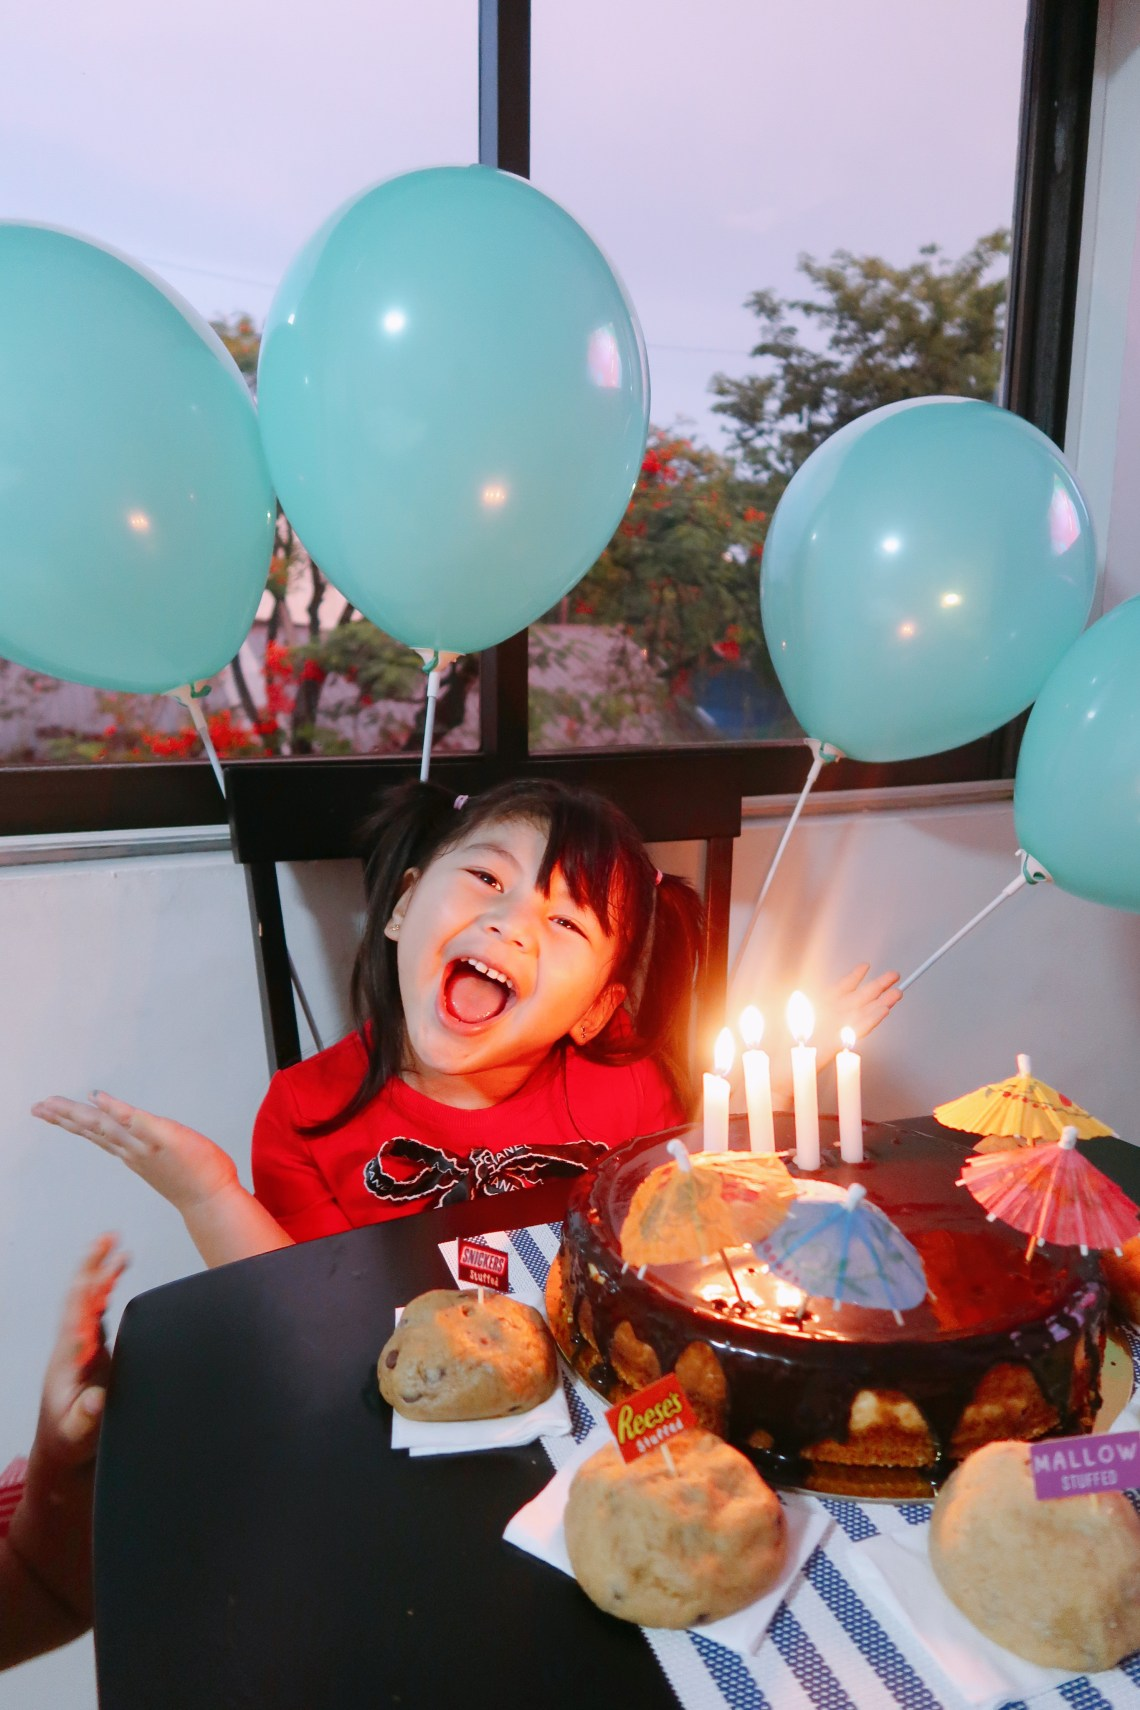 Amaria's birthday